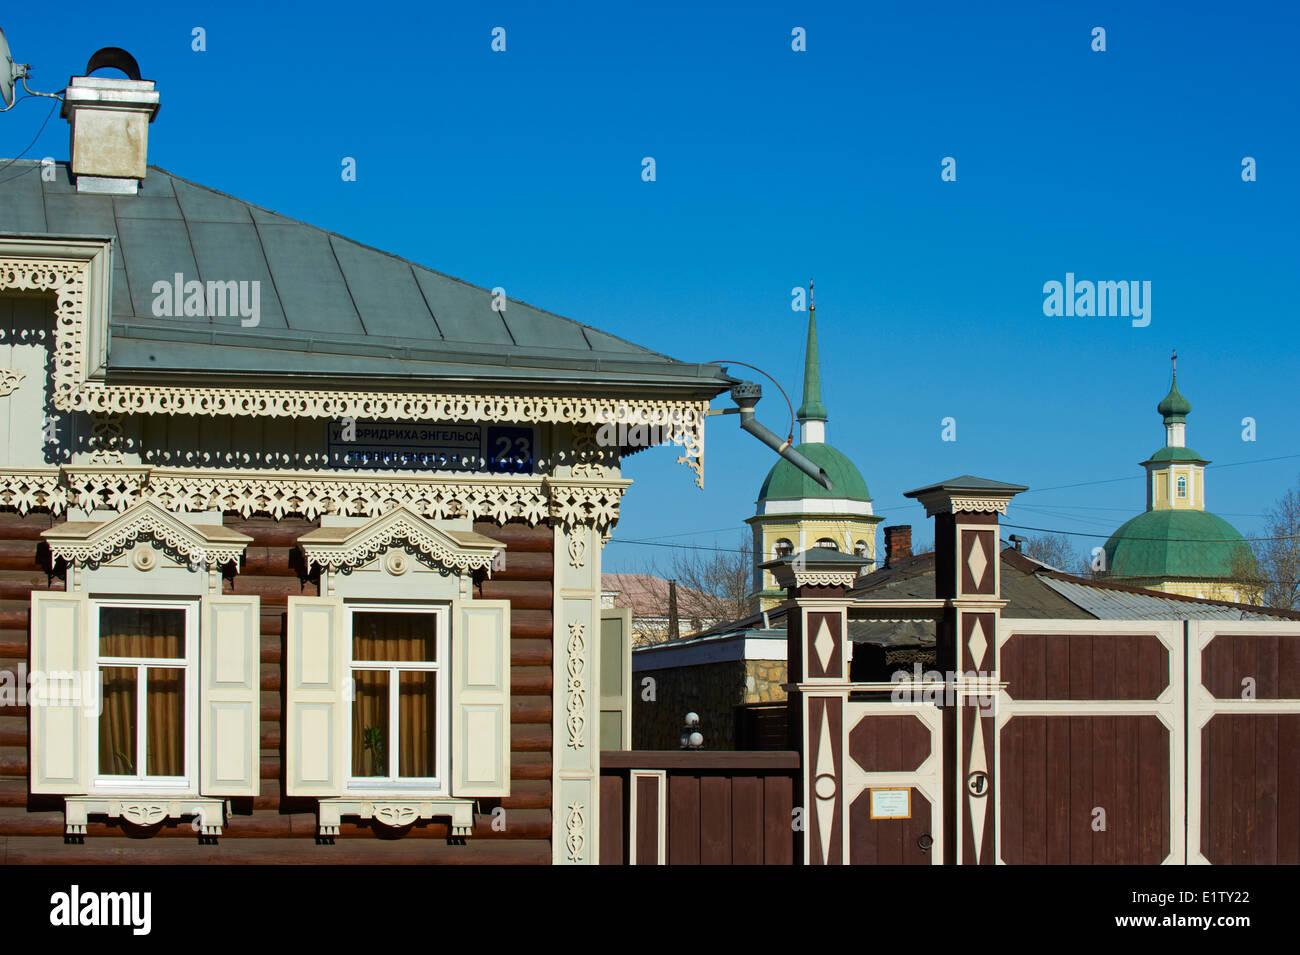 Rusia, Siberia, Irkutsk, arquitectura de madera, la Casa de Europa Imagen De Stock